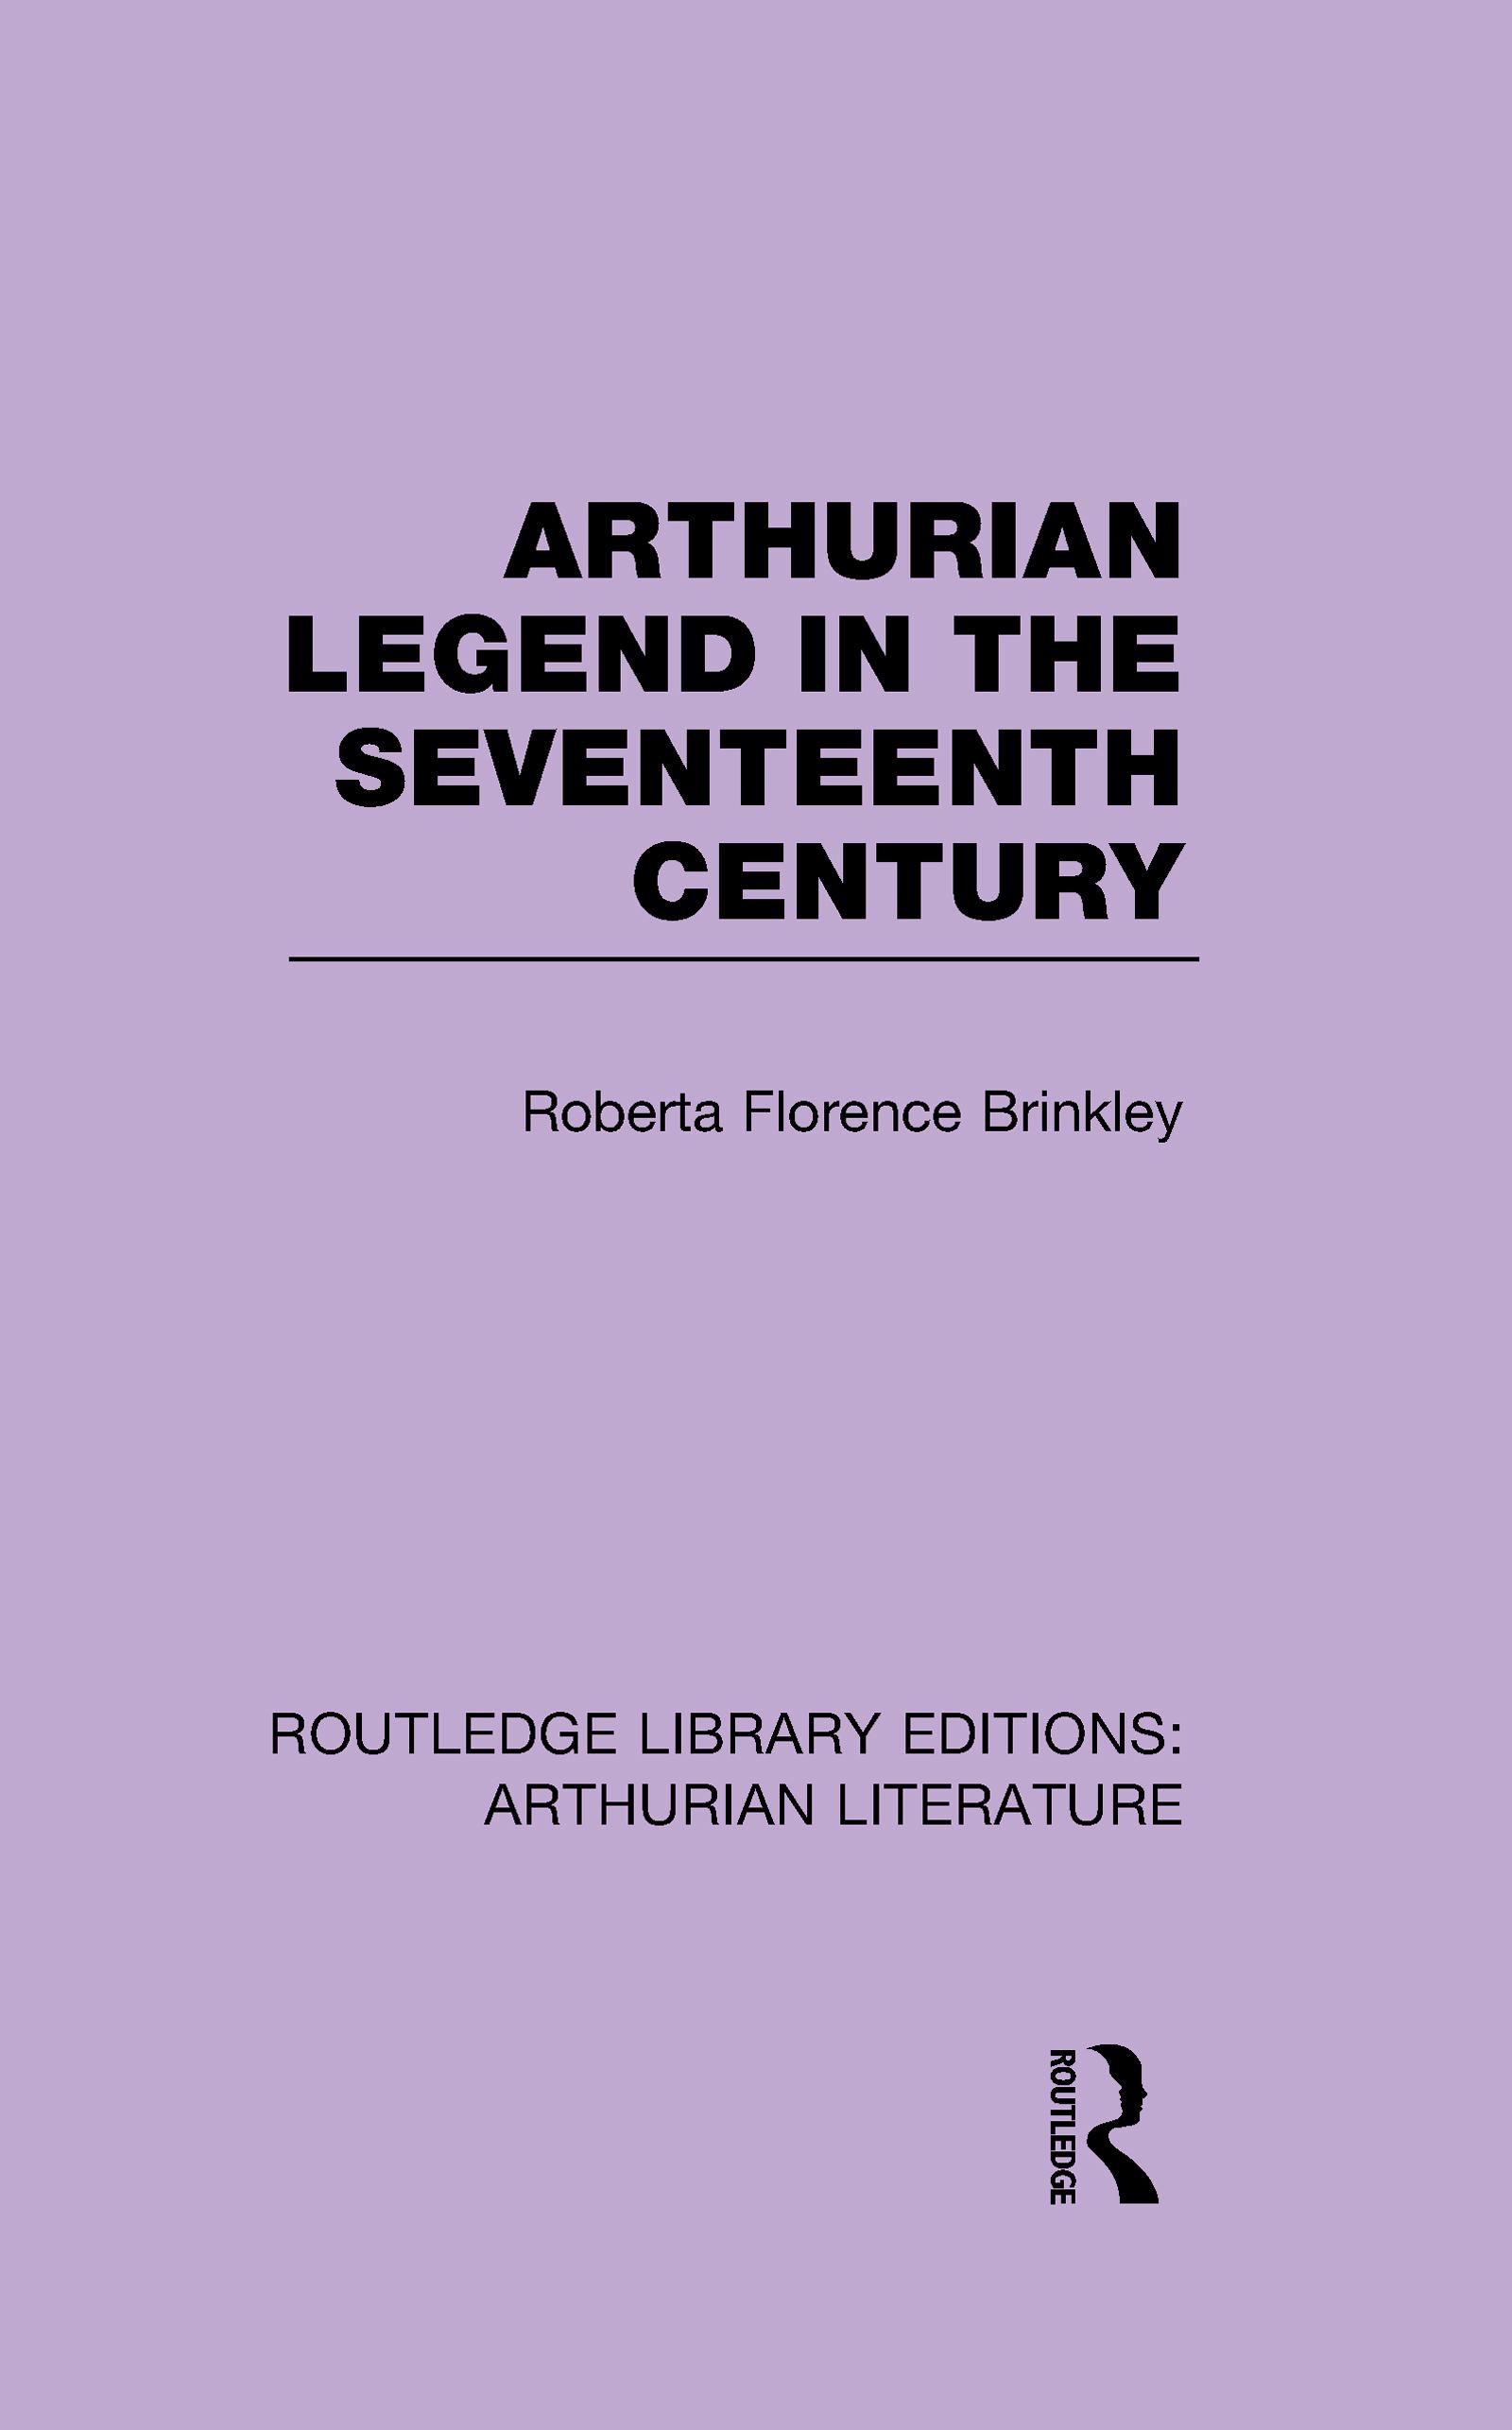 Arthurian Legend in the Seventeenth Century